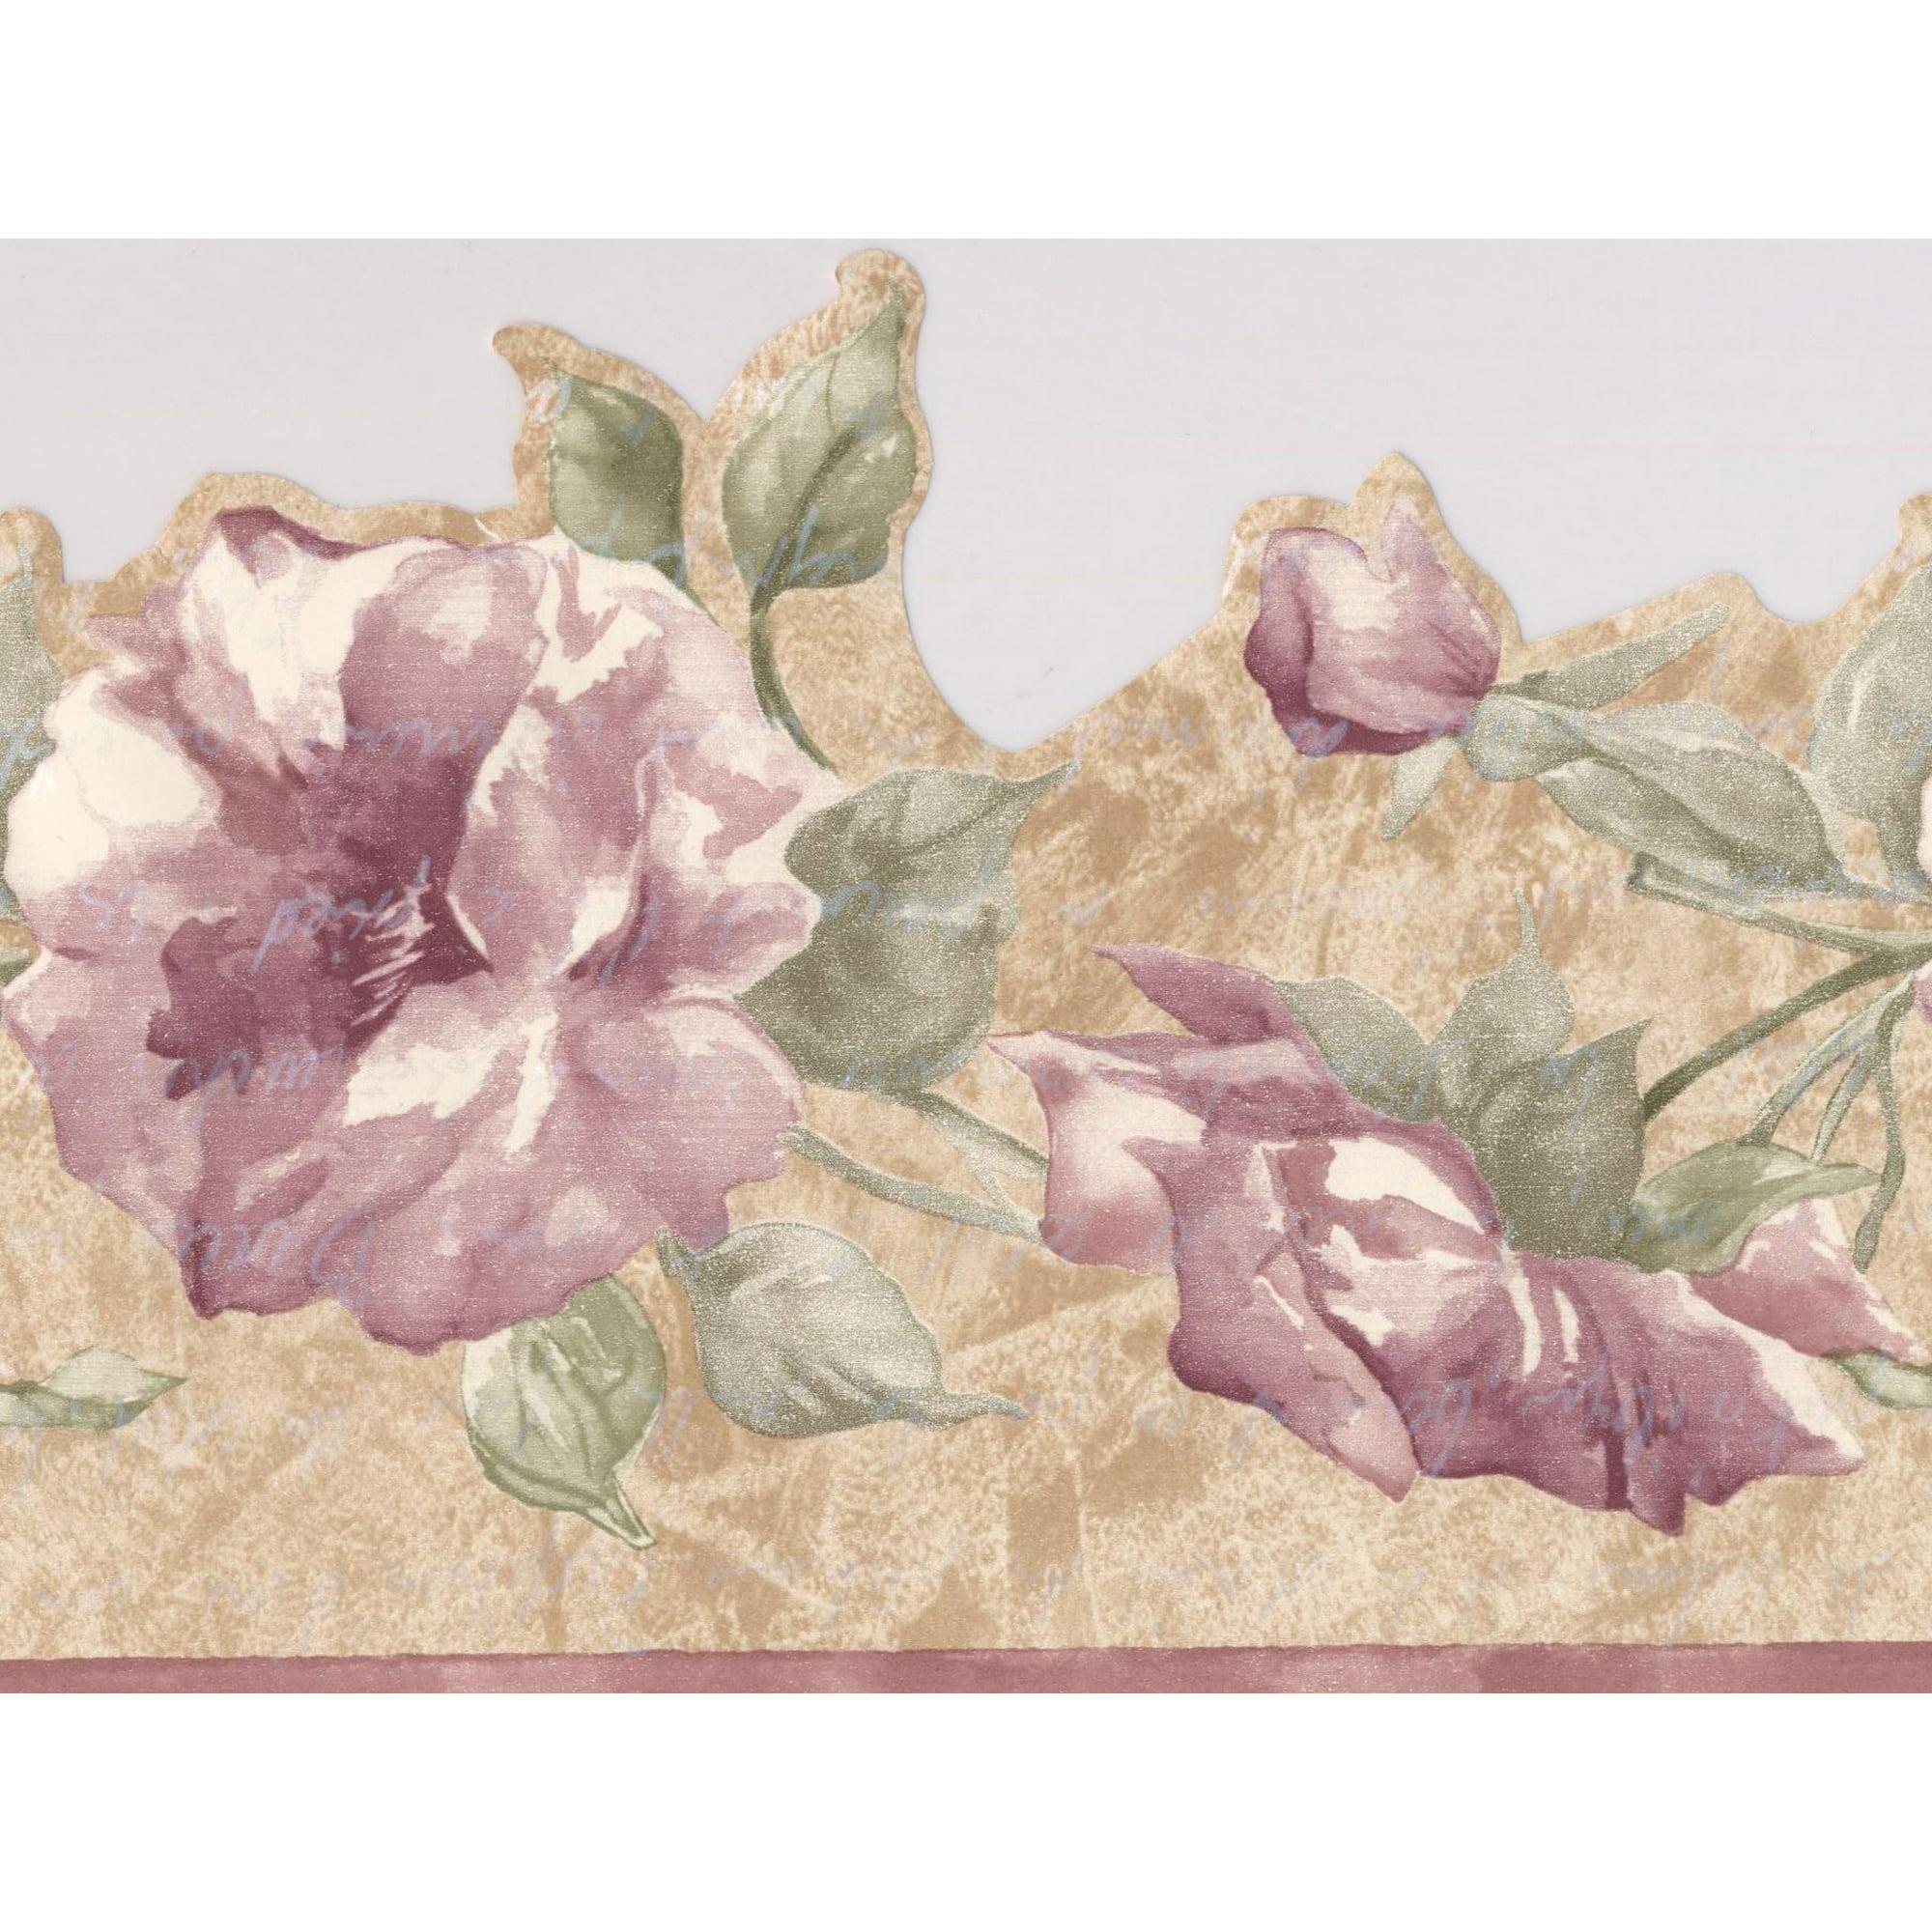 Purple Flowers On Vine Beige Floral Wallpaper Border Retro Design